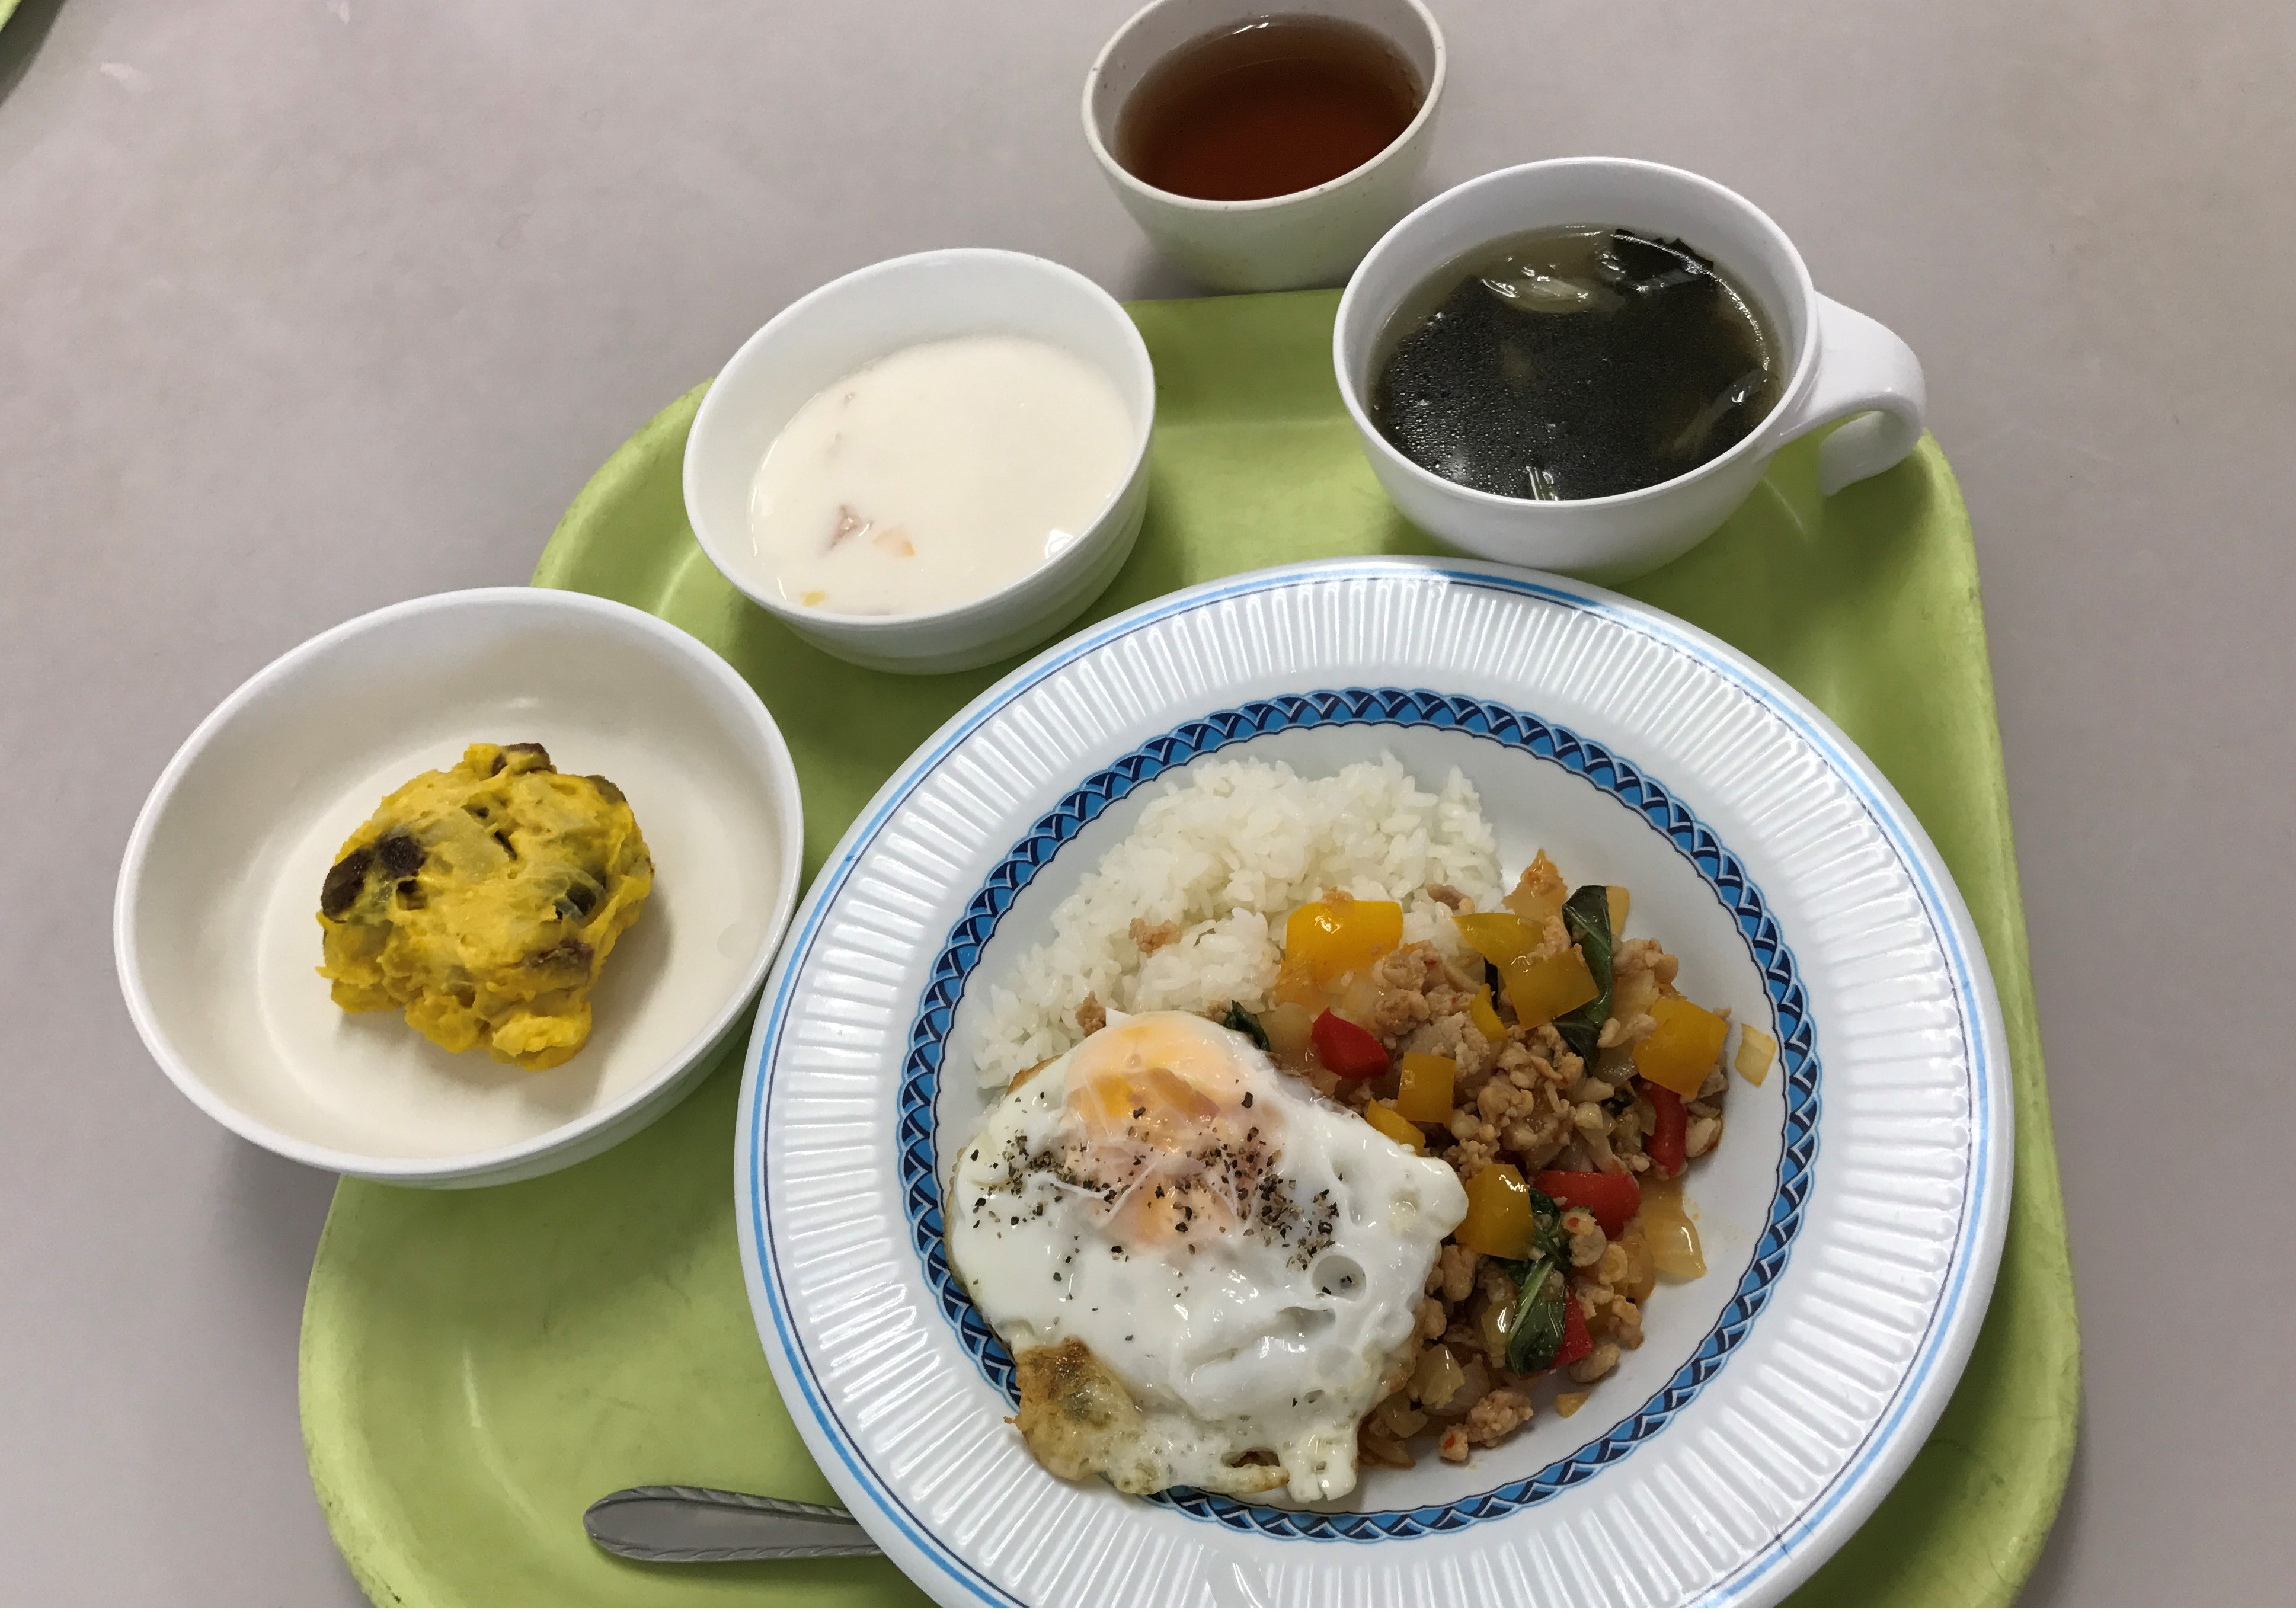 http://chichibu-med.jp/ndblog/IMG_7207.JPG